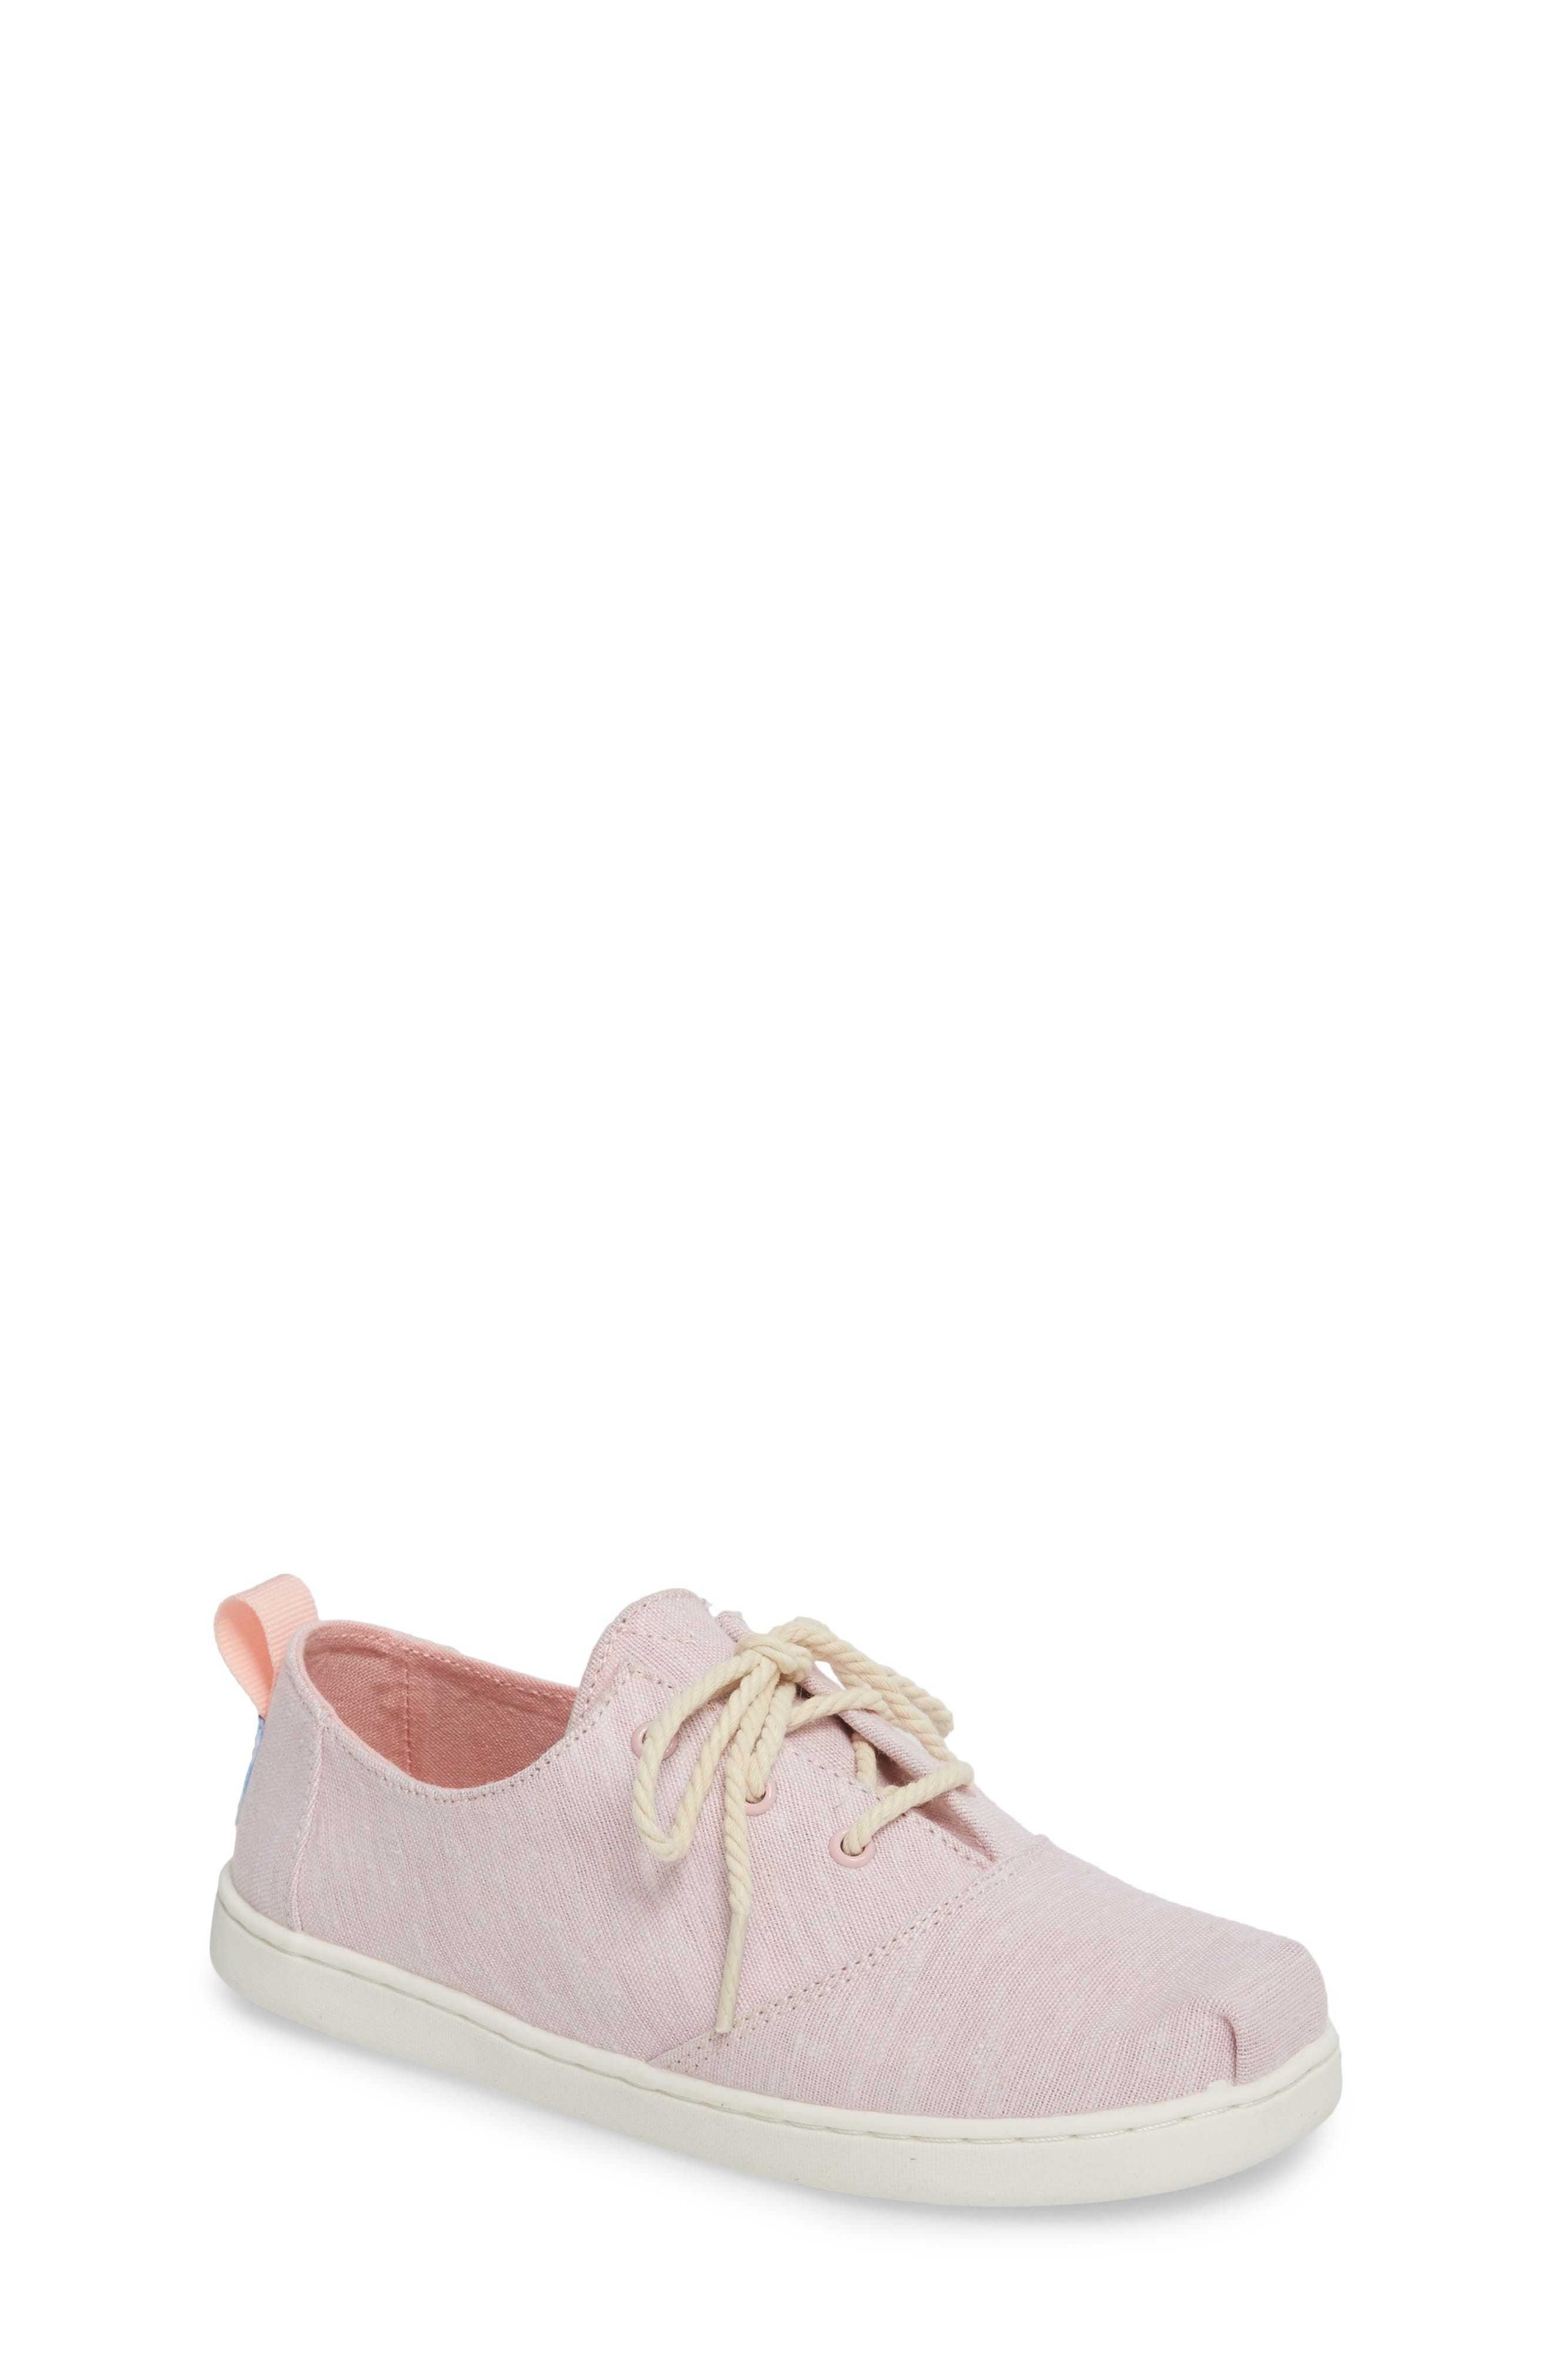 Lumin Sneaker,                         Main,                         color, 650